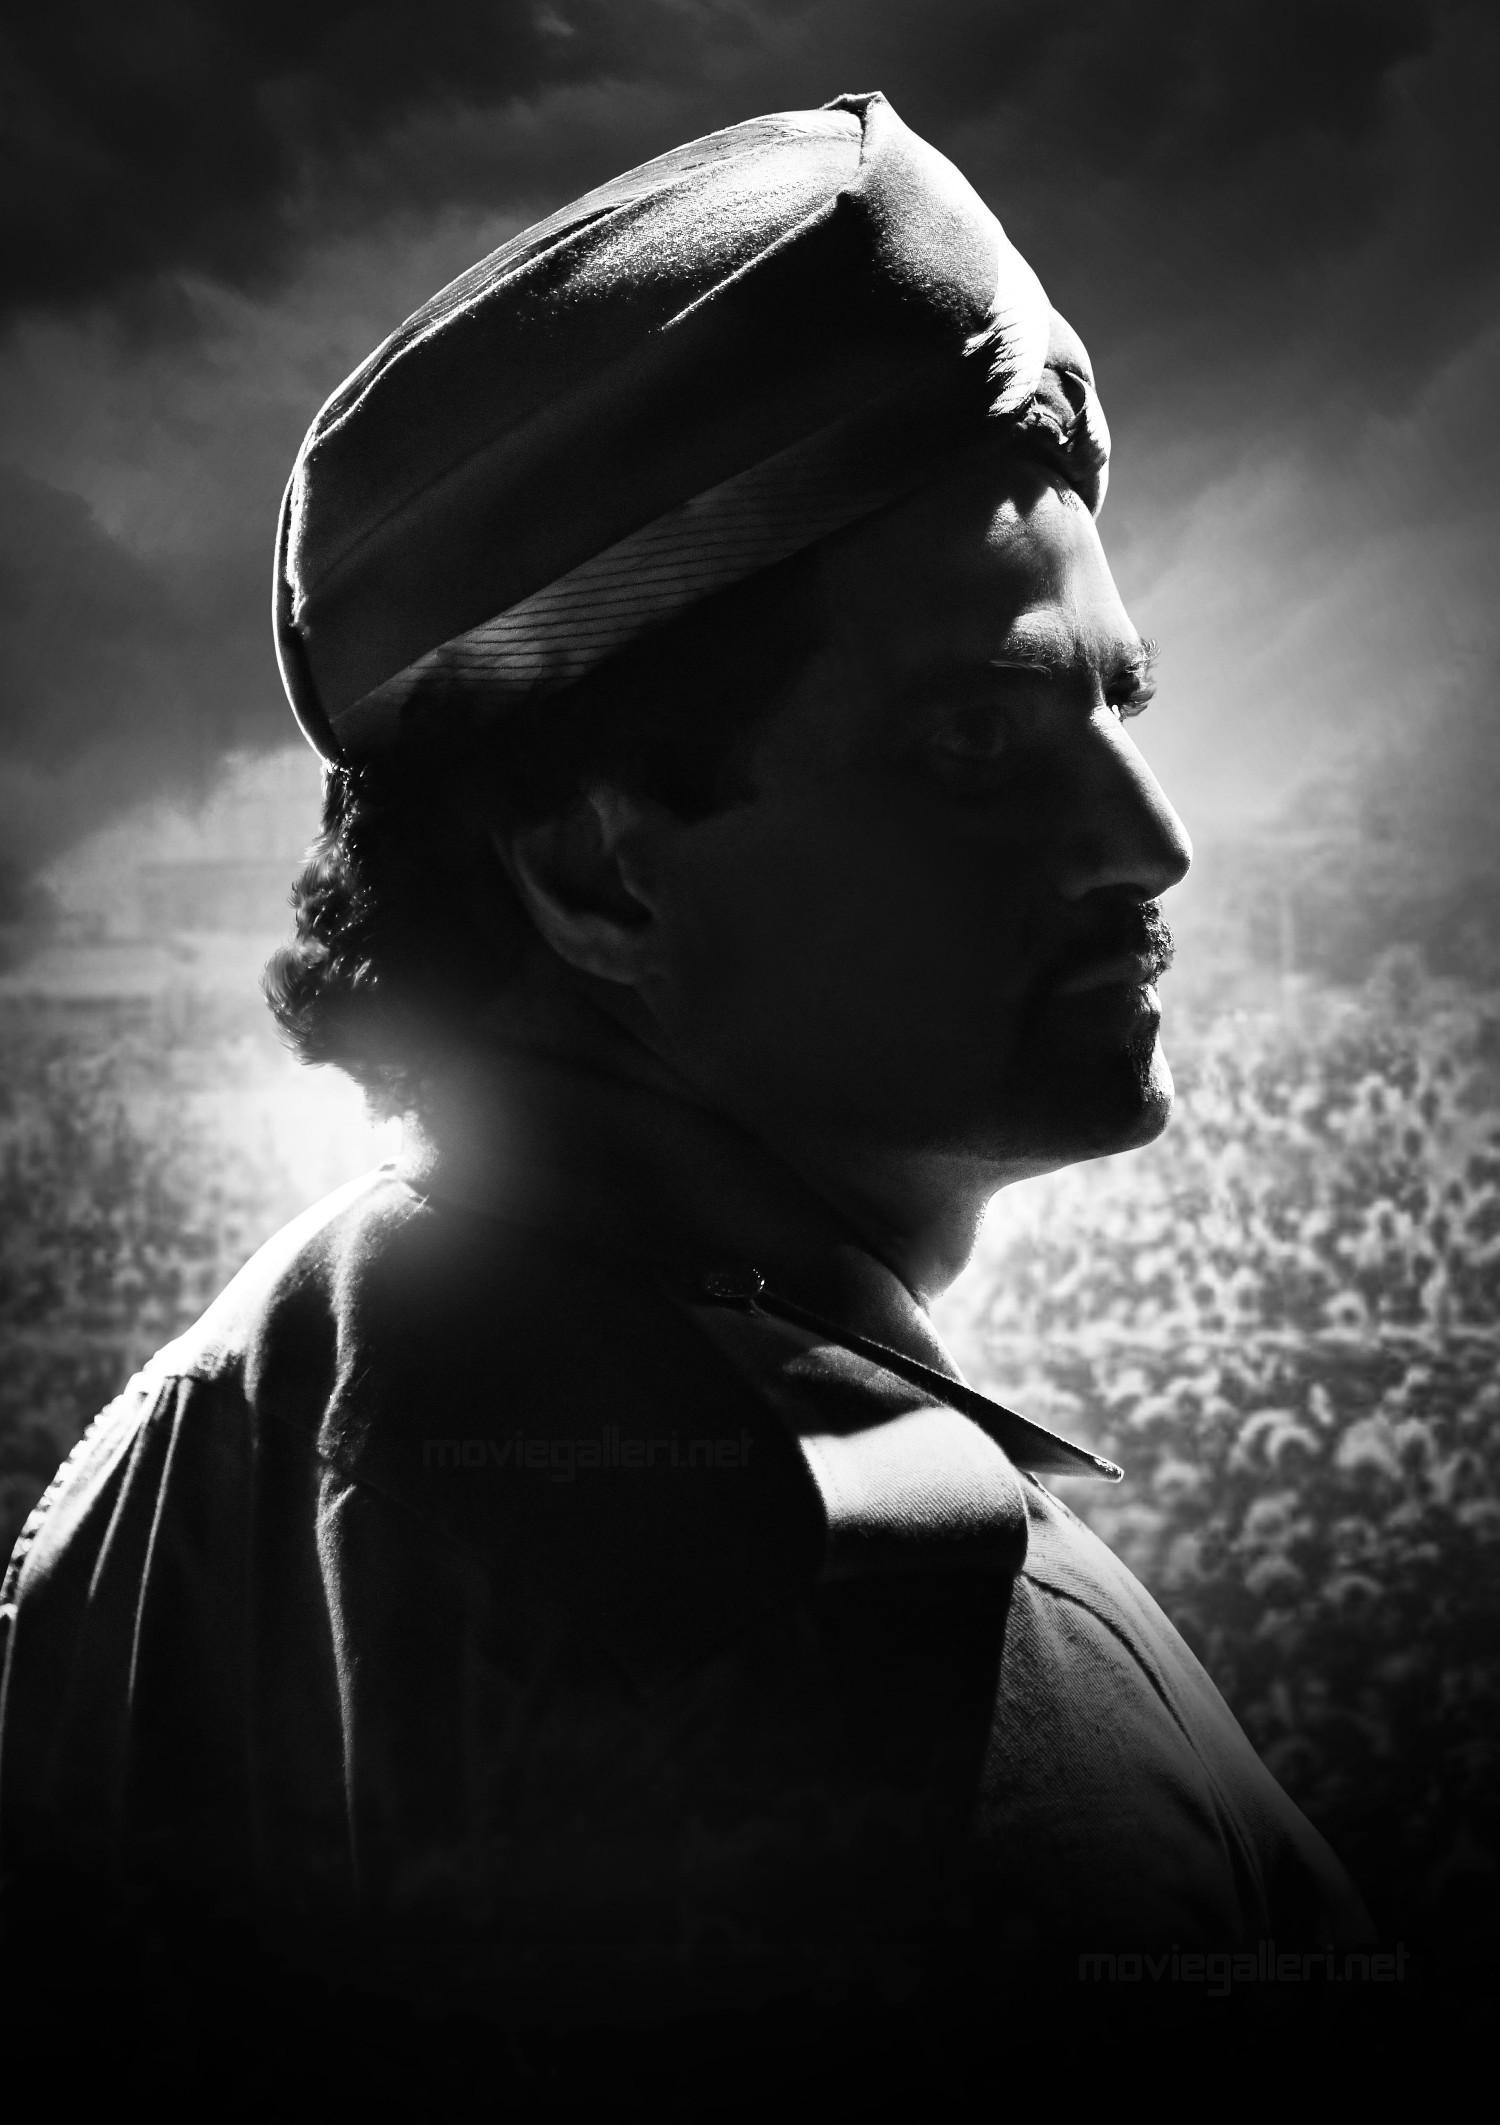 Nandamuri Balakrishna NTR Biopic Movie New HD Image